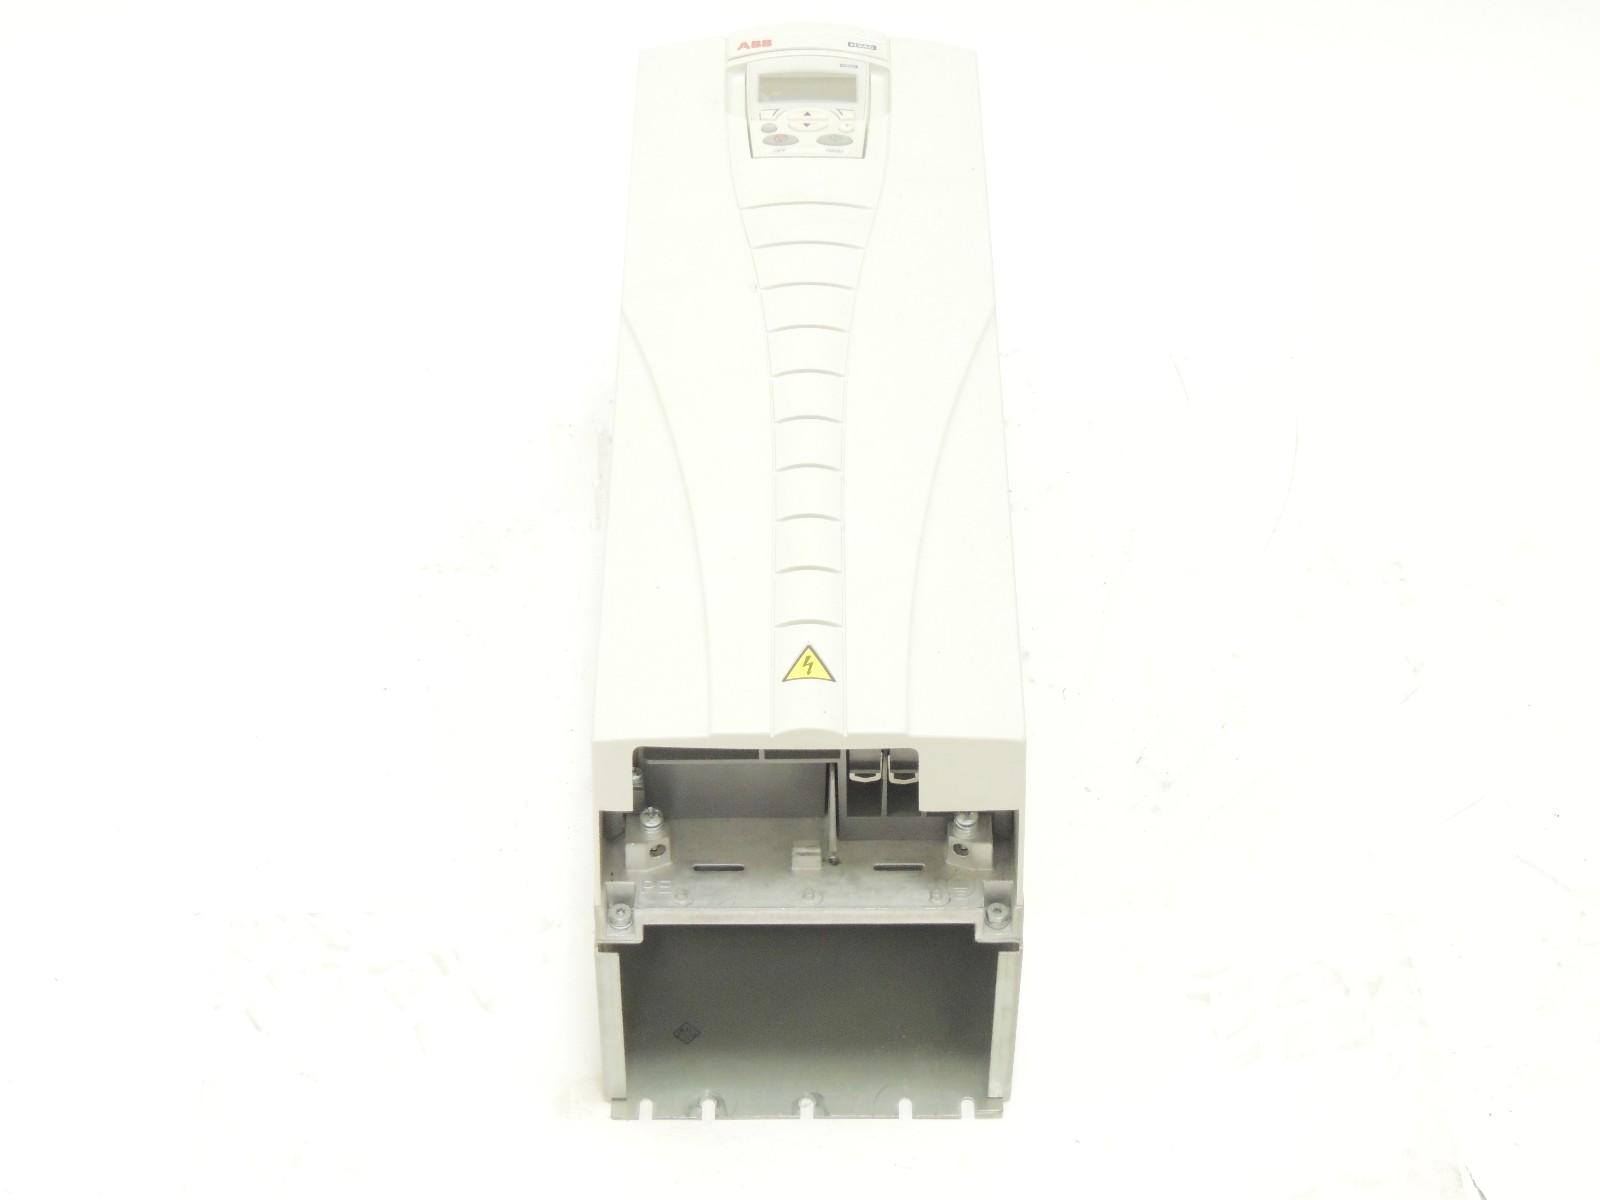 abb ach550 vfd wiring diagram 1999 honda civic engine variable sd control get free